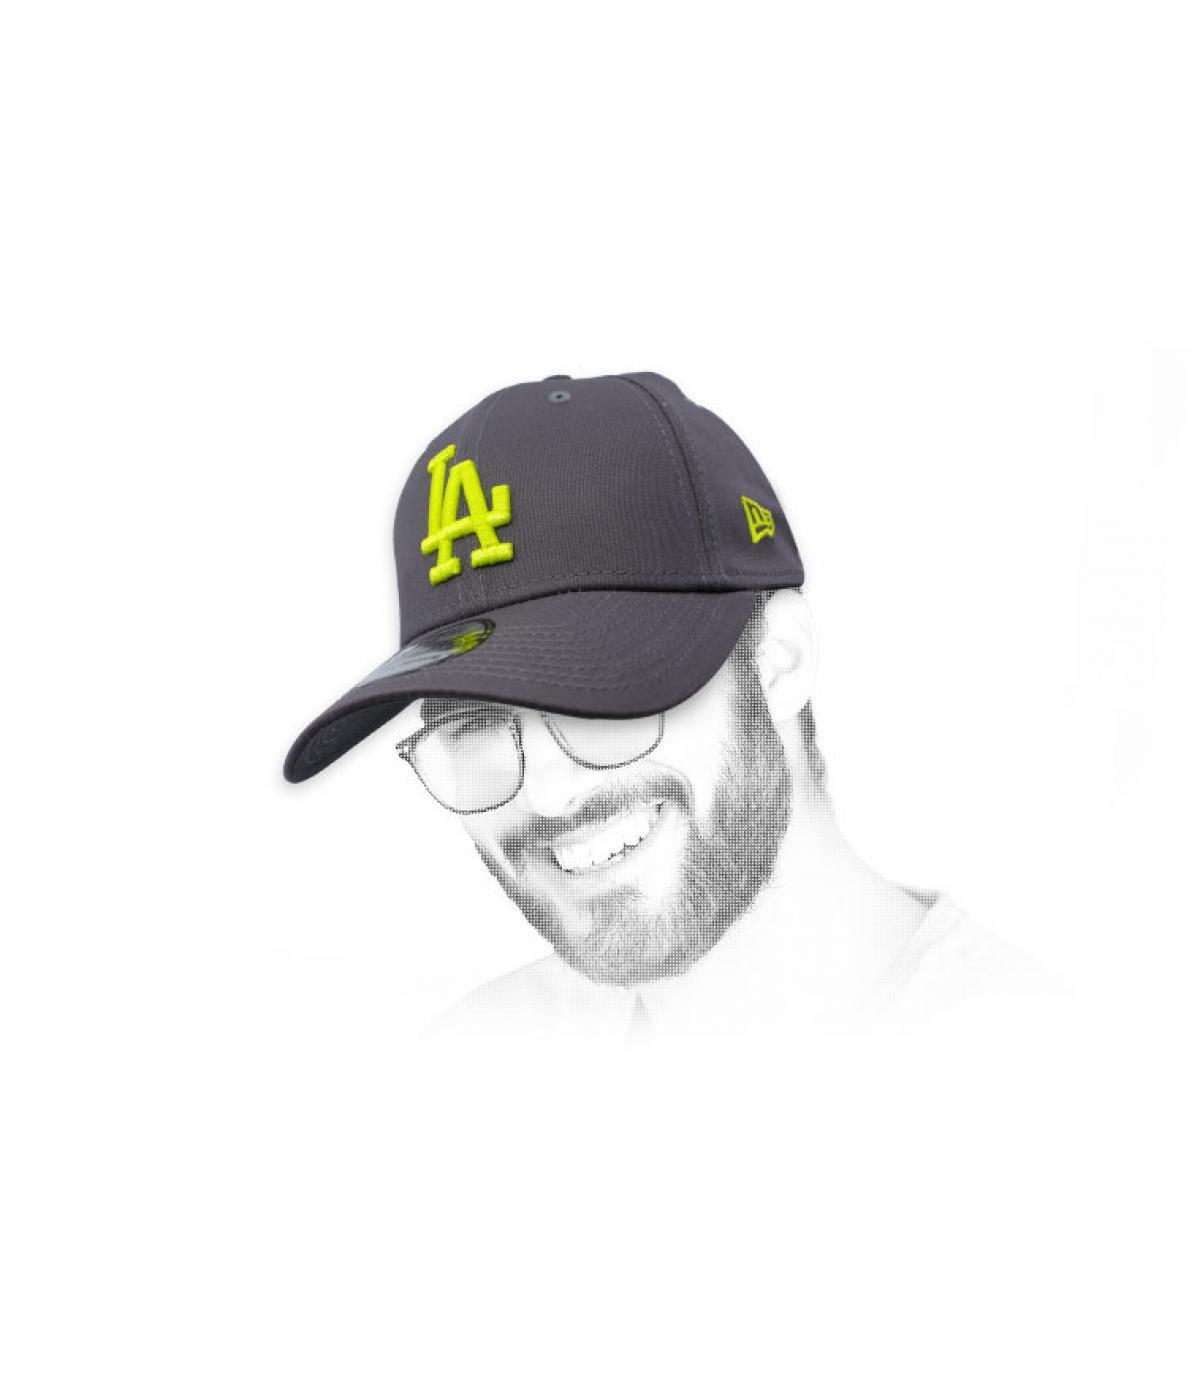 grey and yellow LA cap